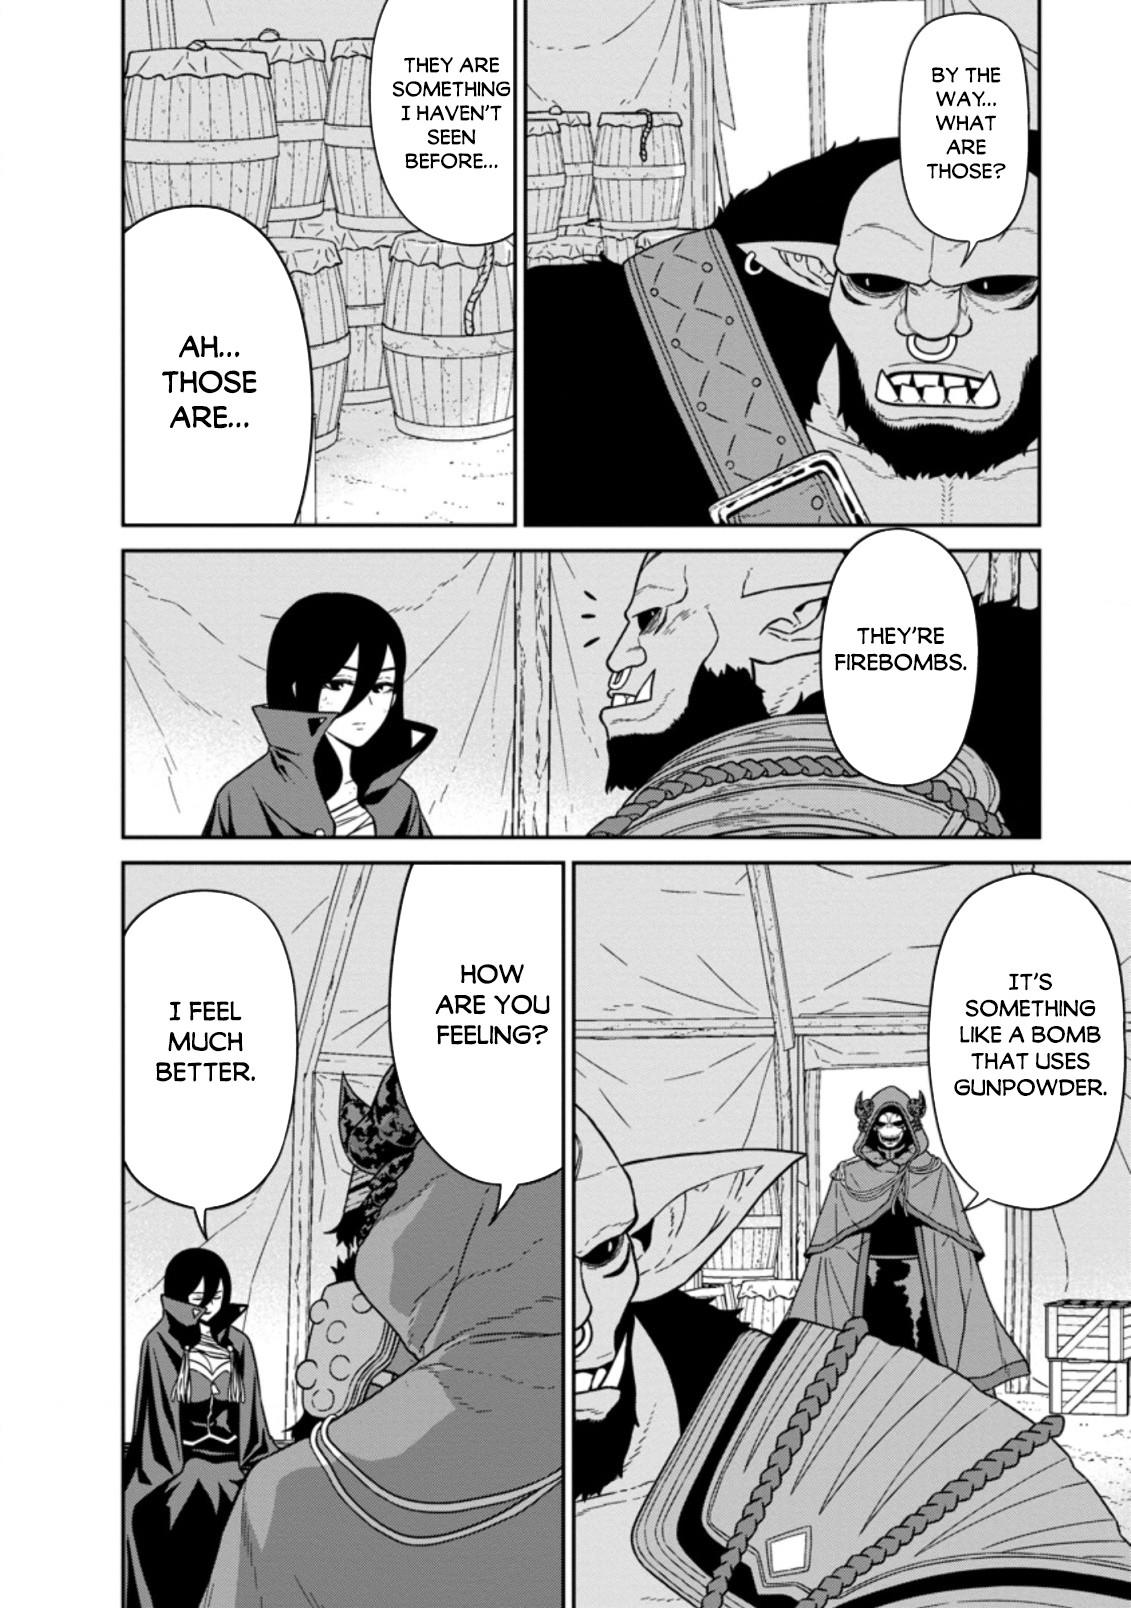 Maou Gun Saikyou No Majutsushi Wa Ningen Datta Chapter 19.1 page 7 - Mangakakalots.com